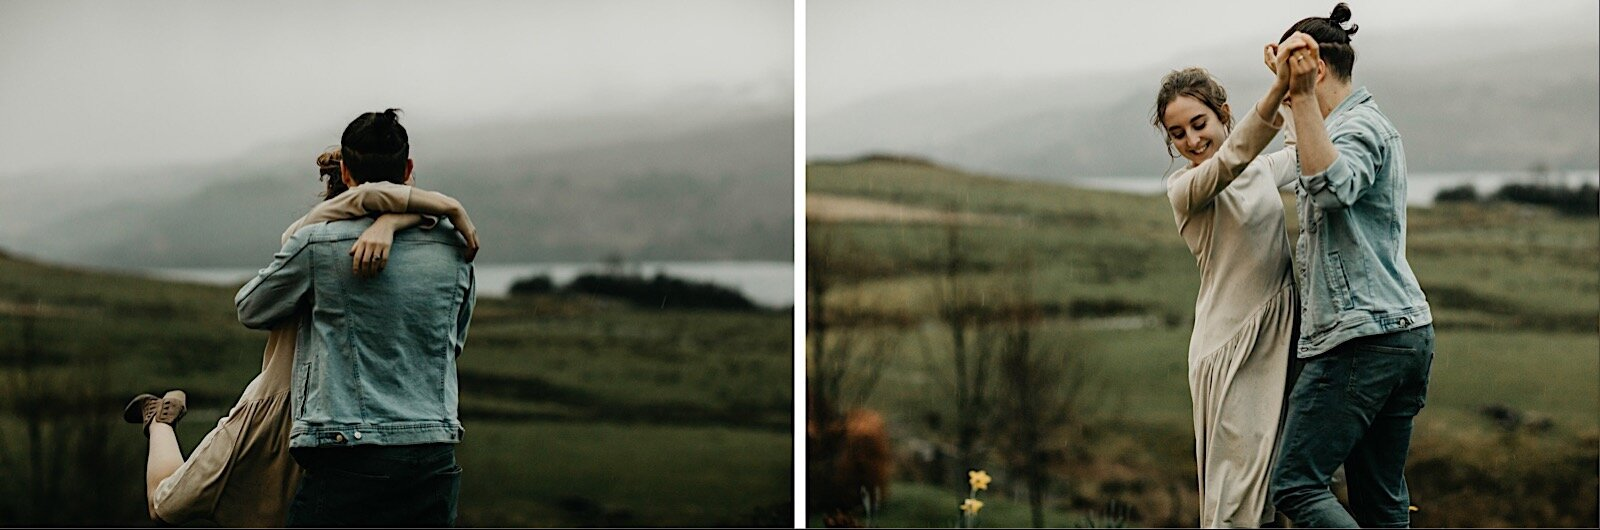 11_scotland_couple_shoot_lety_photography (17 von 36)_scotland_couple_shoot_lety_photography (16 von 36).jpg